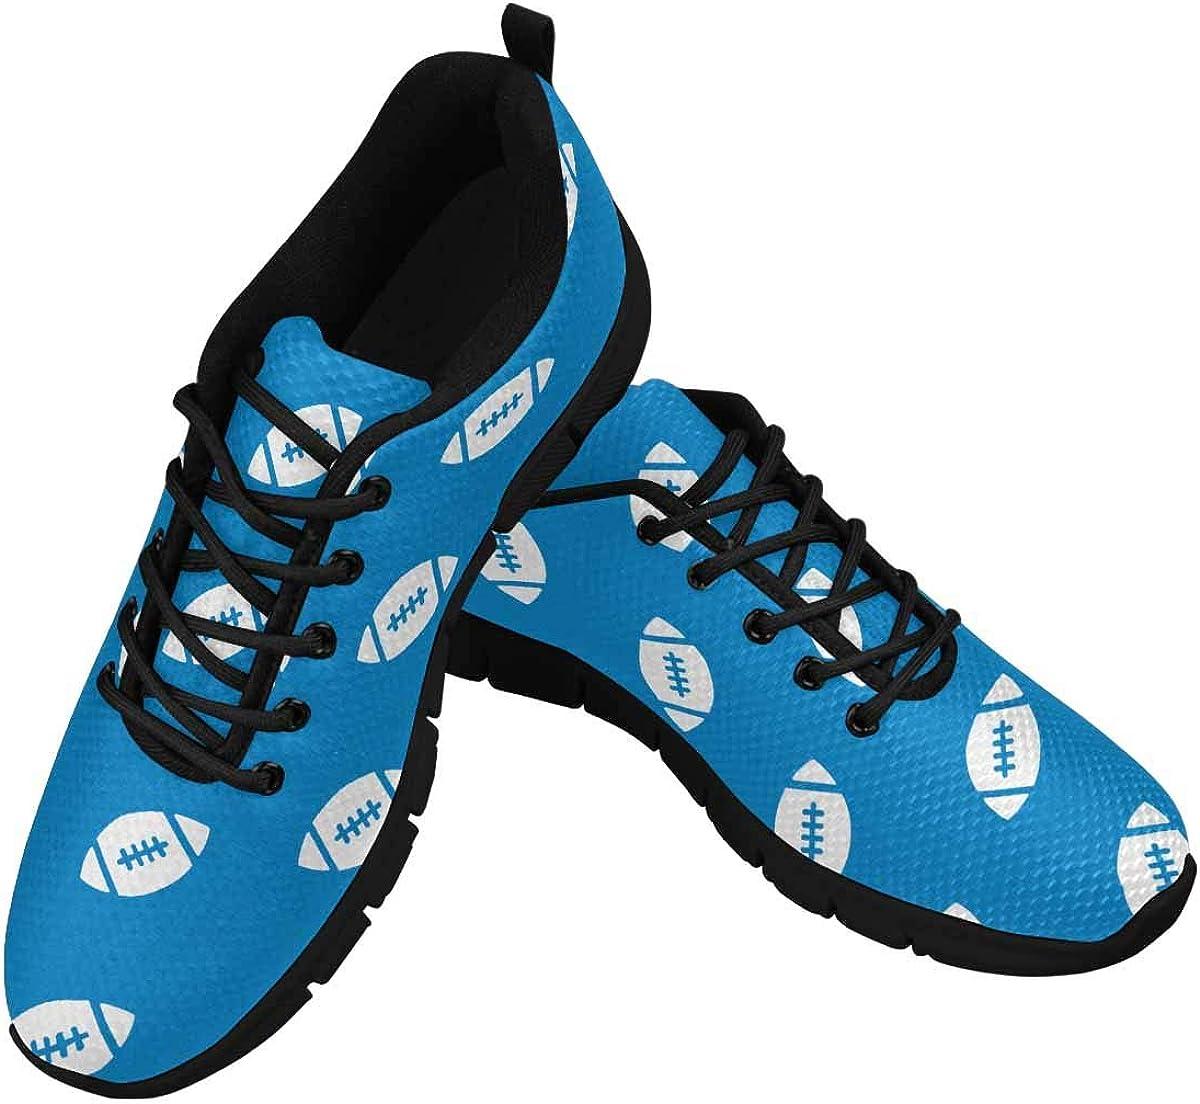 INTERESTPRINT American Football Light Blue Women's Lace Up Running Comfort Sports Sneakers